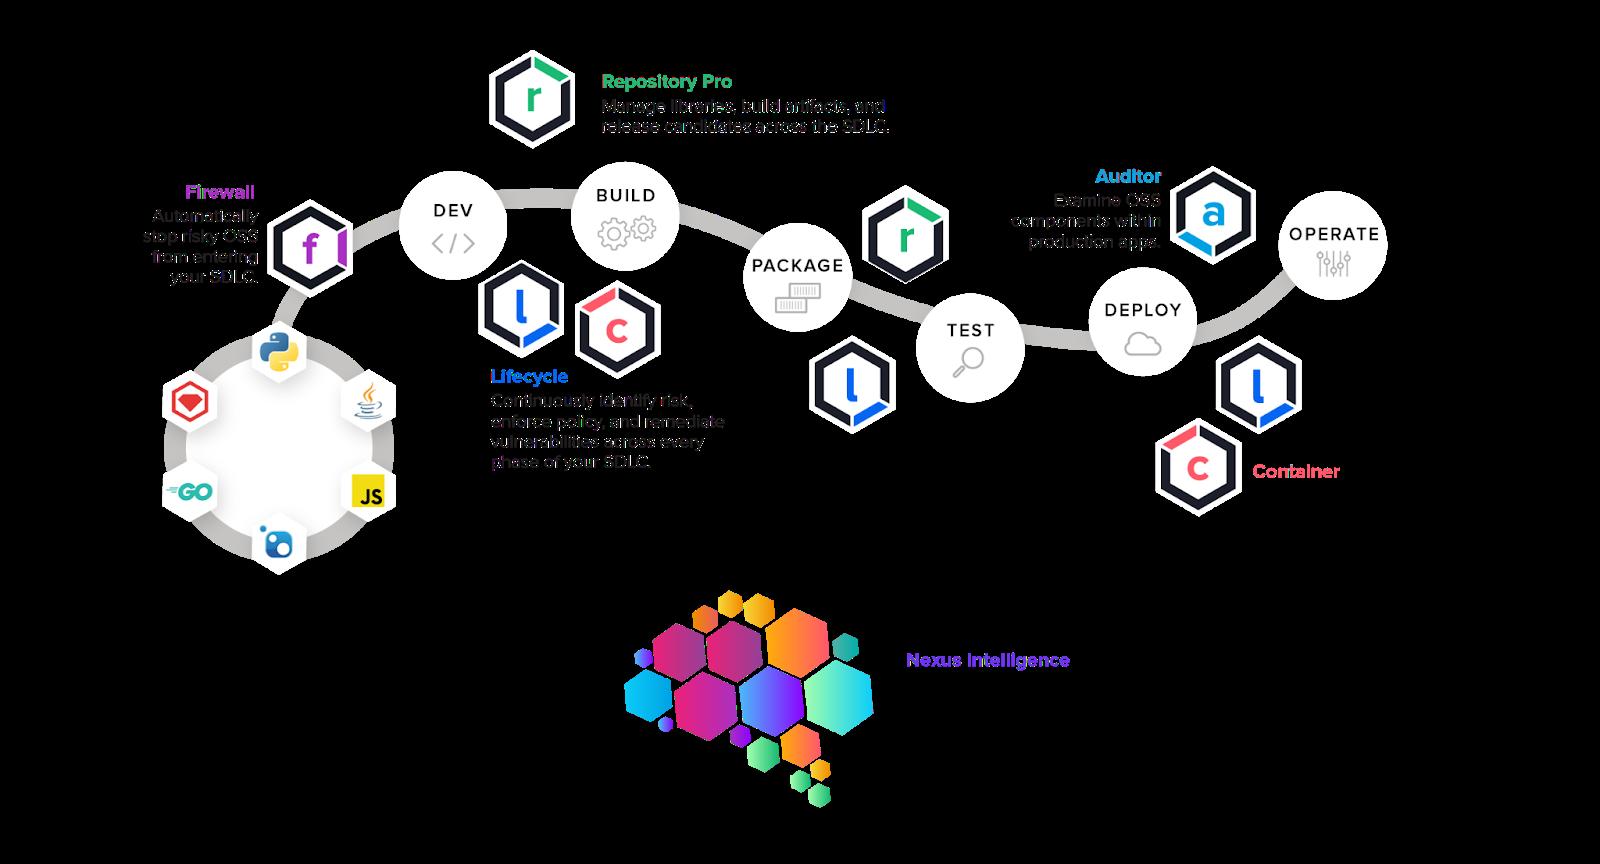 Software Supply Chain and Nexus platform integration